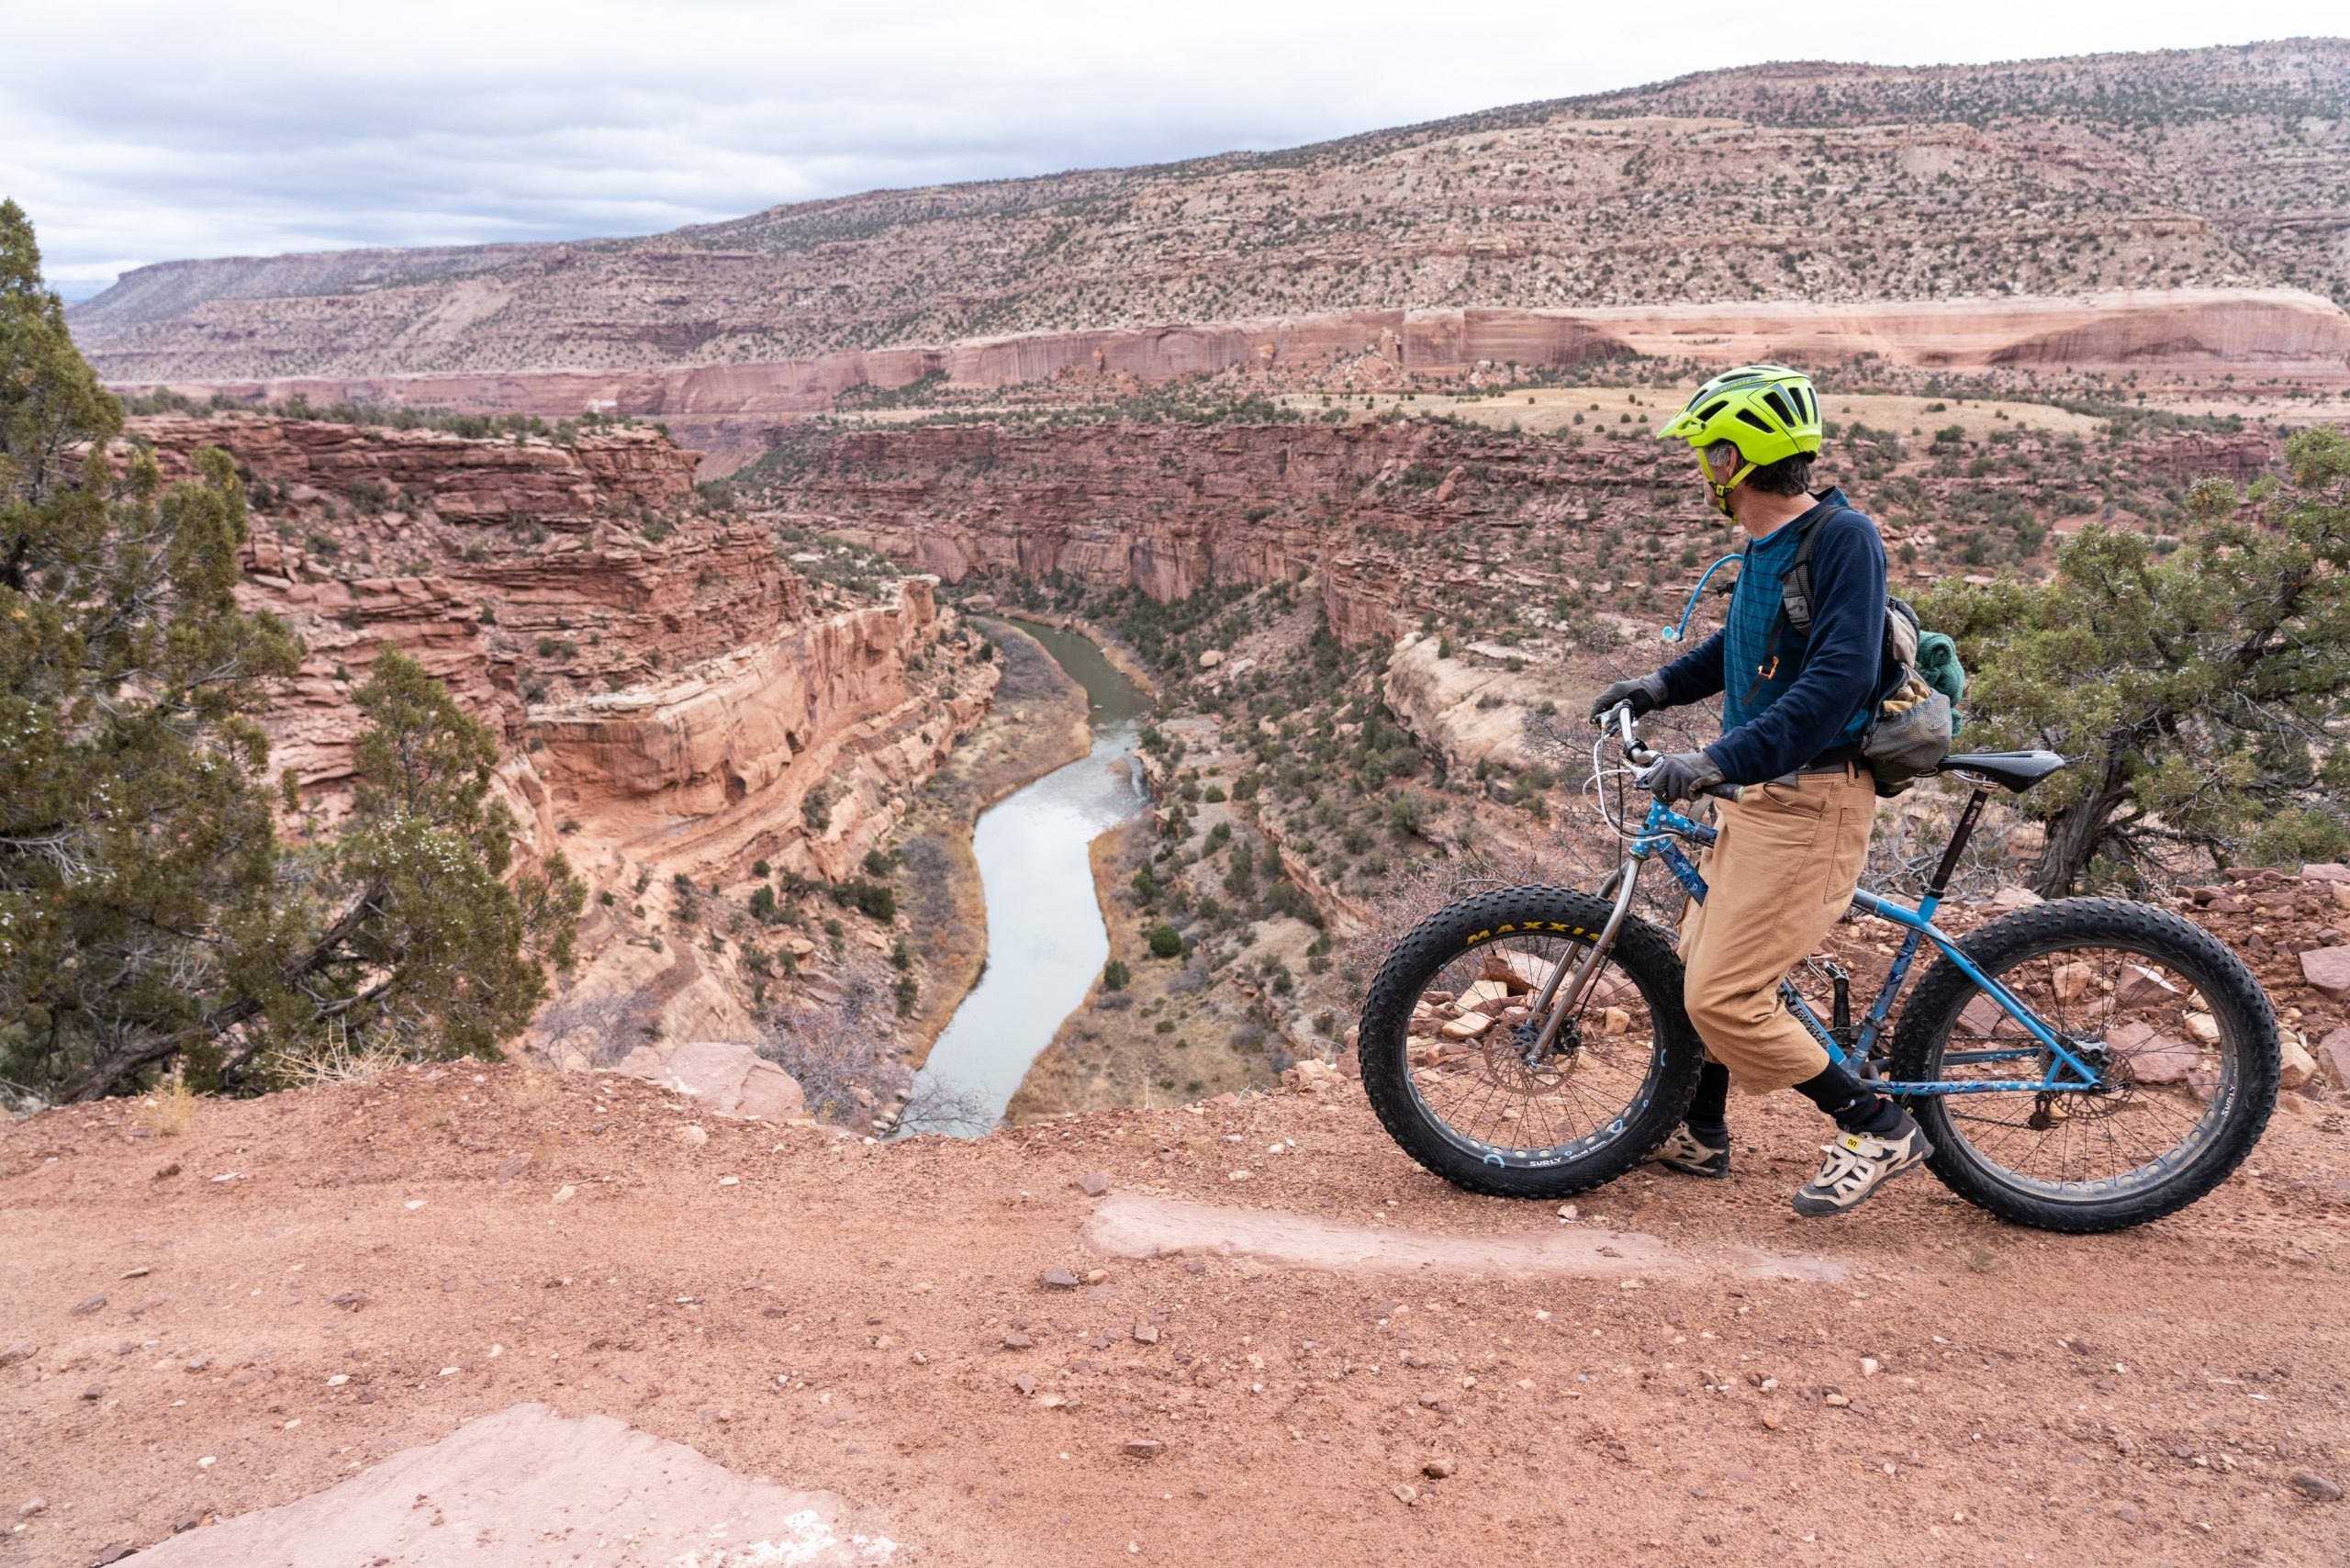 The San Miguel River - Rim rocker Bikerafting Tour